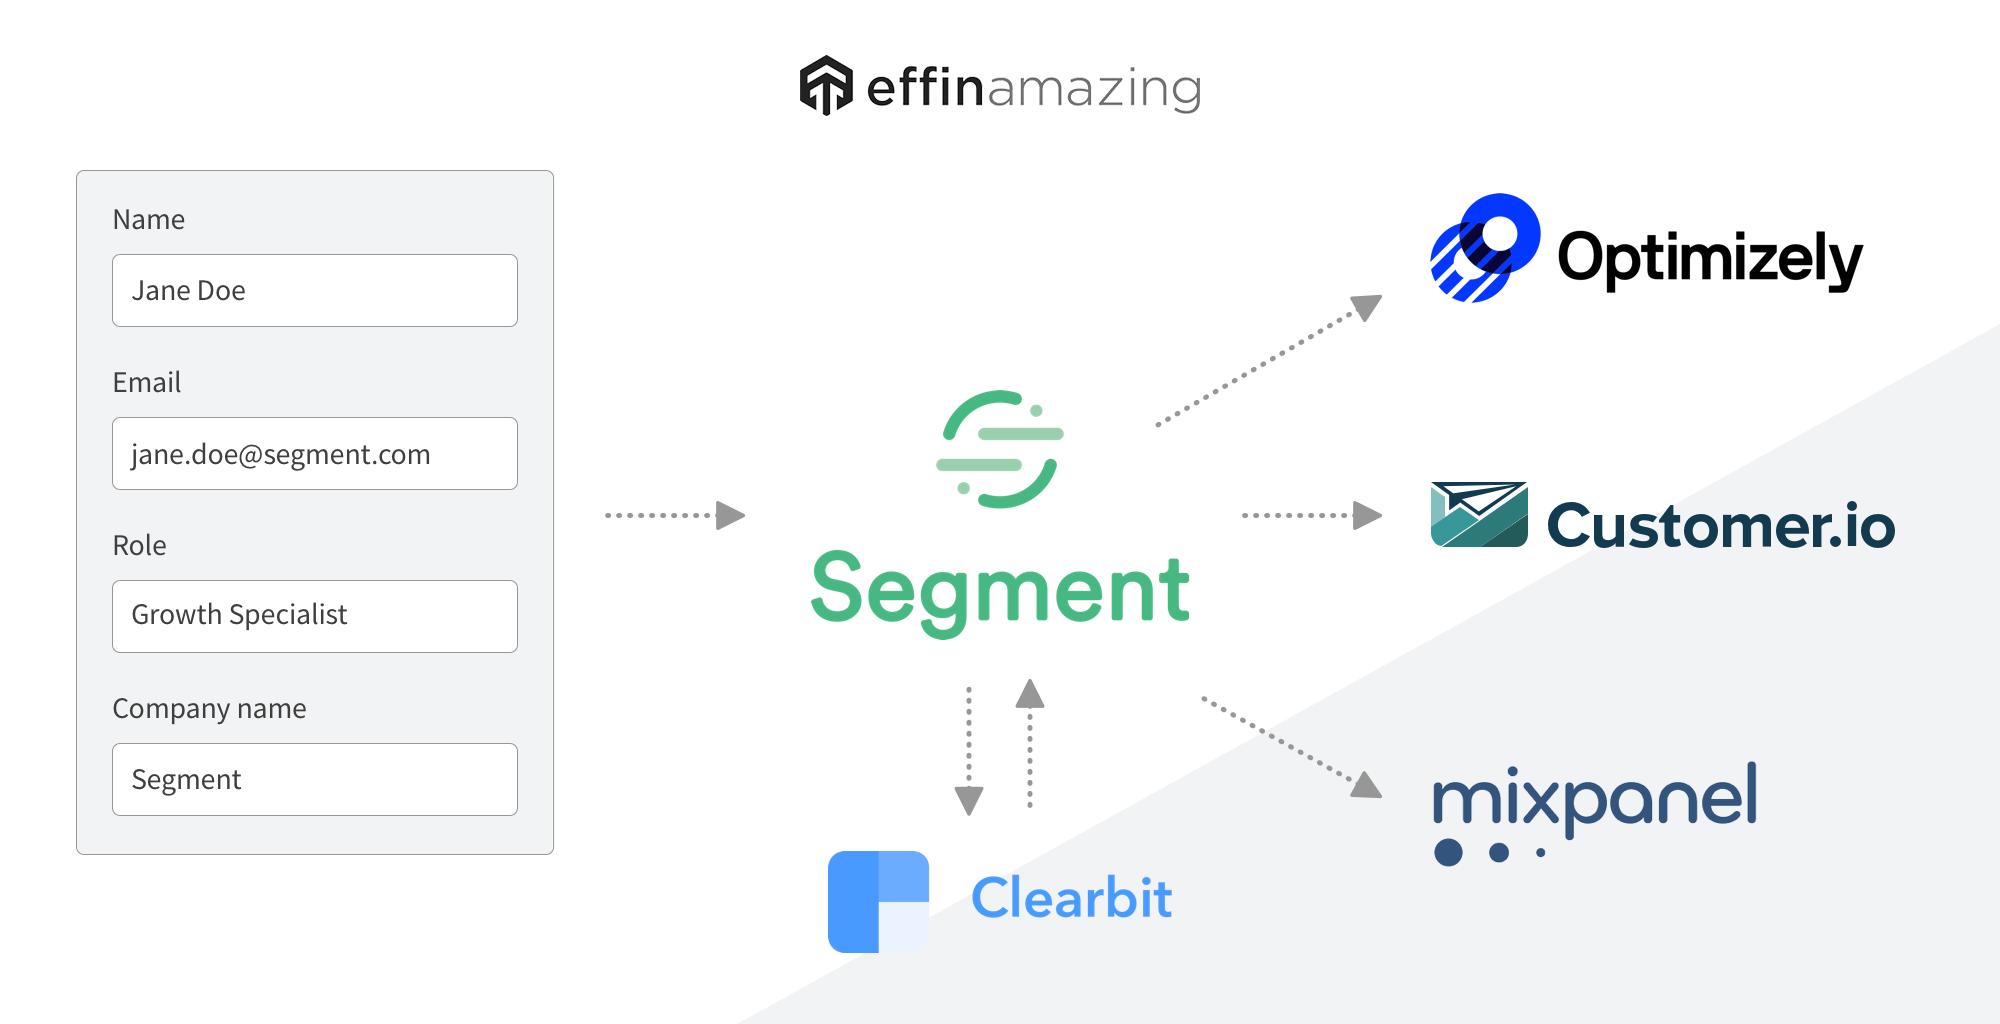 clearbit segment integration example